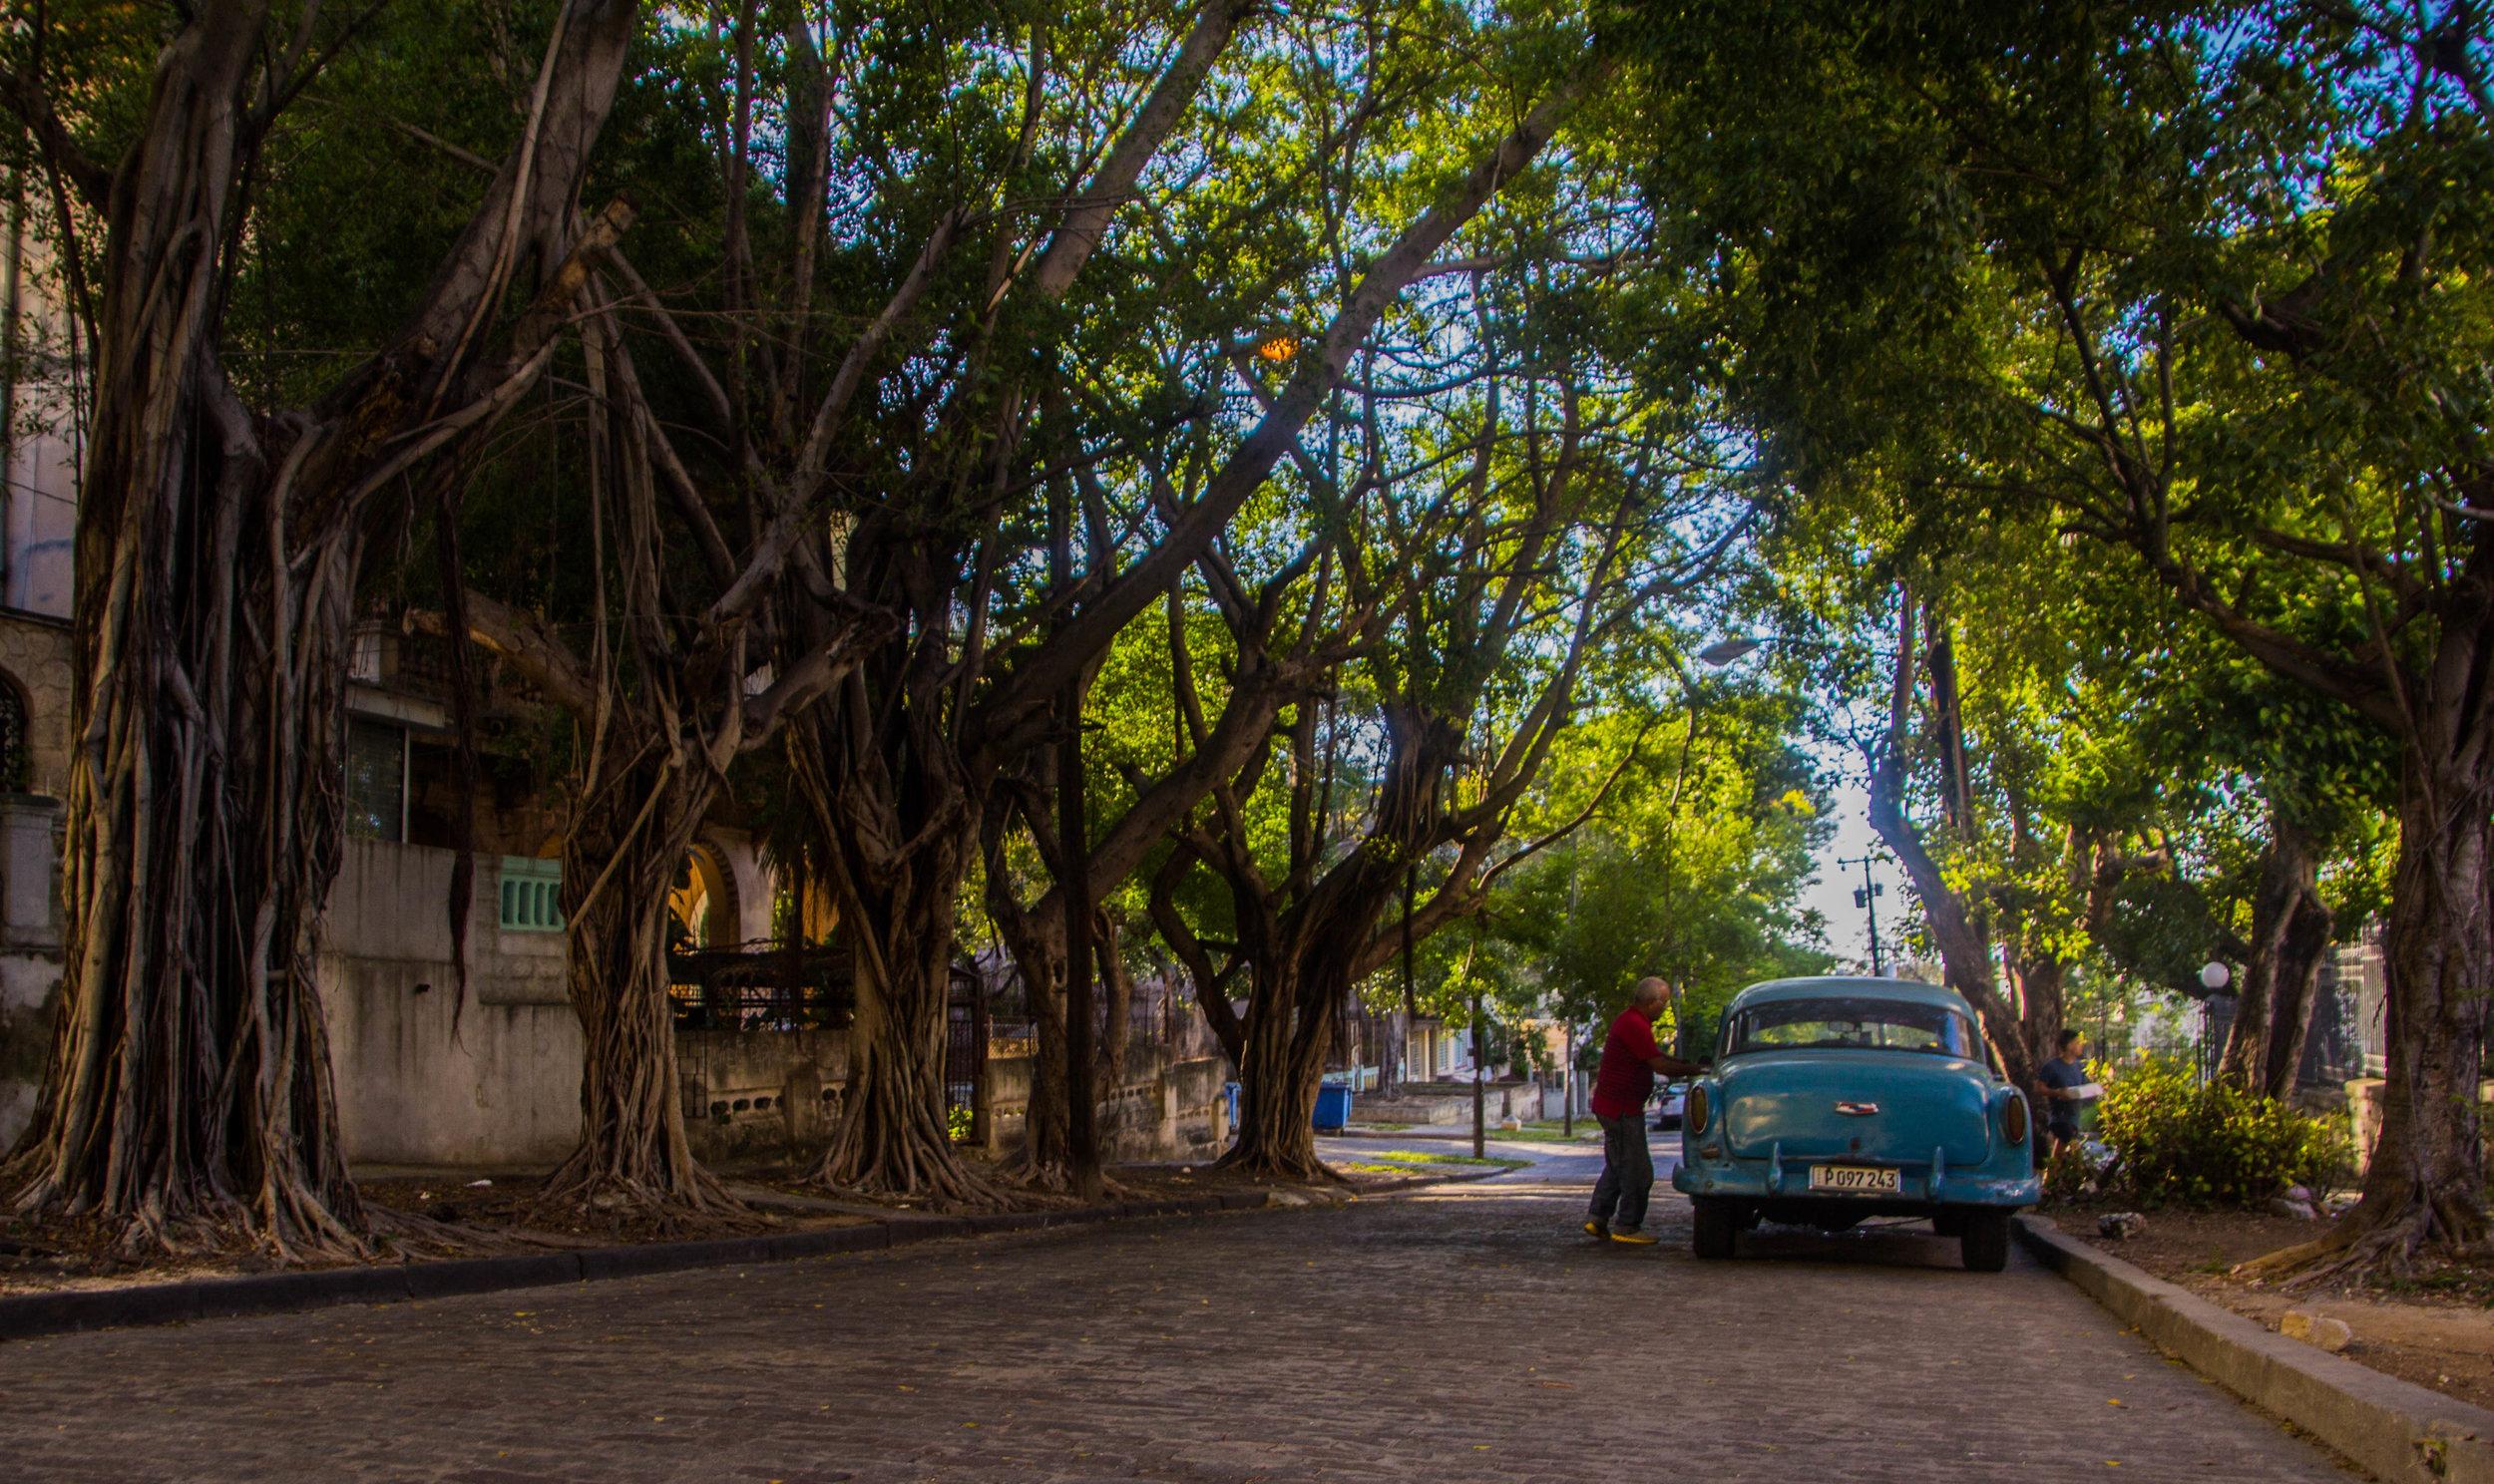 university of havana cuba-1-3-2.jpg